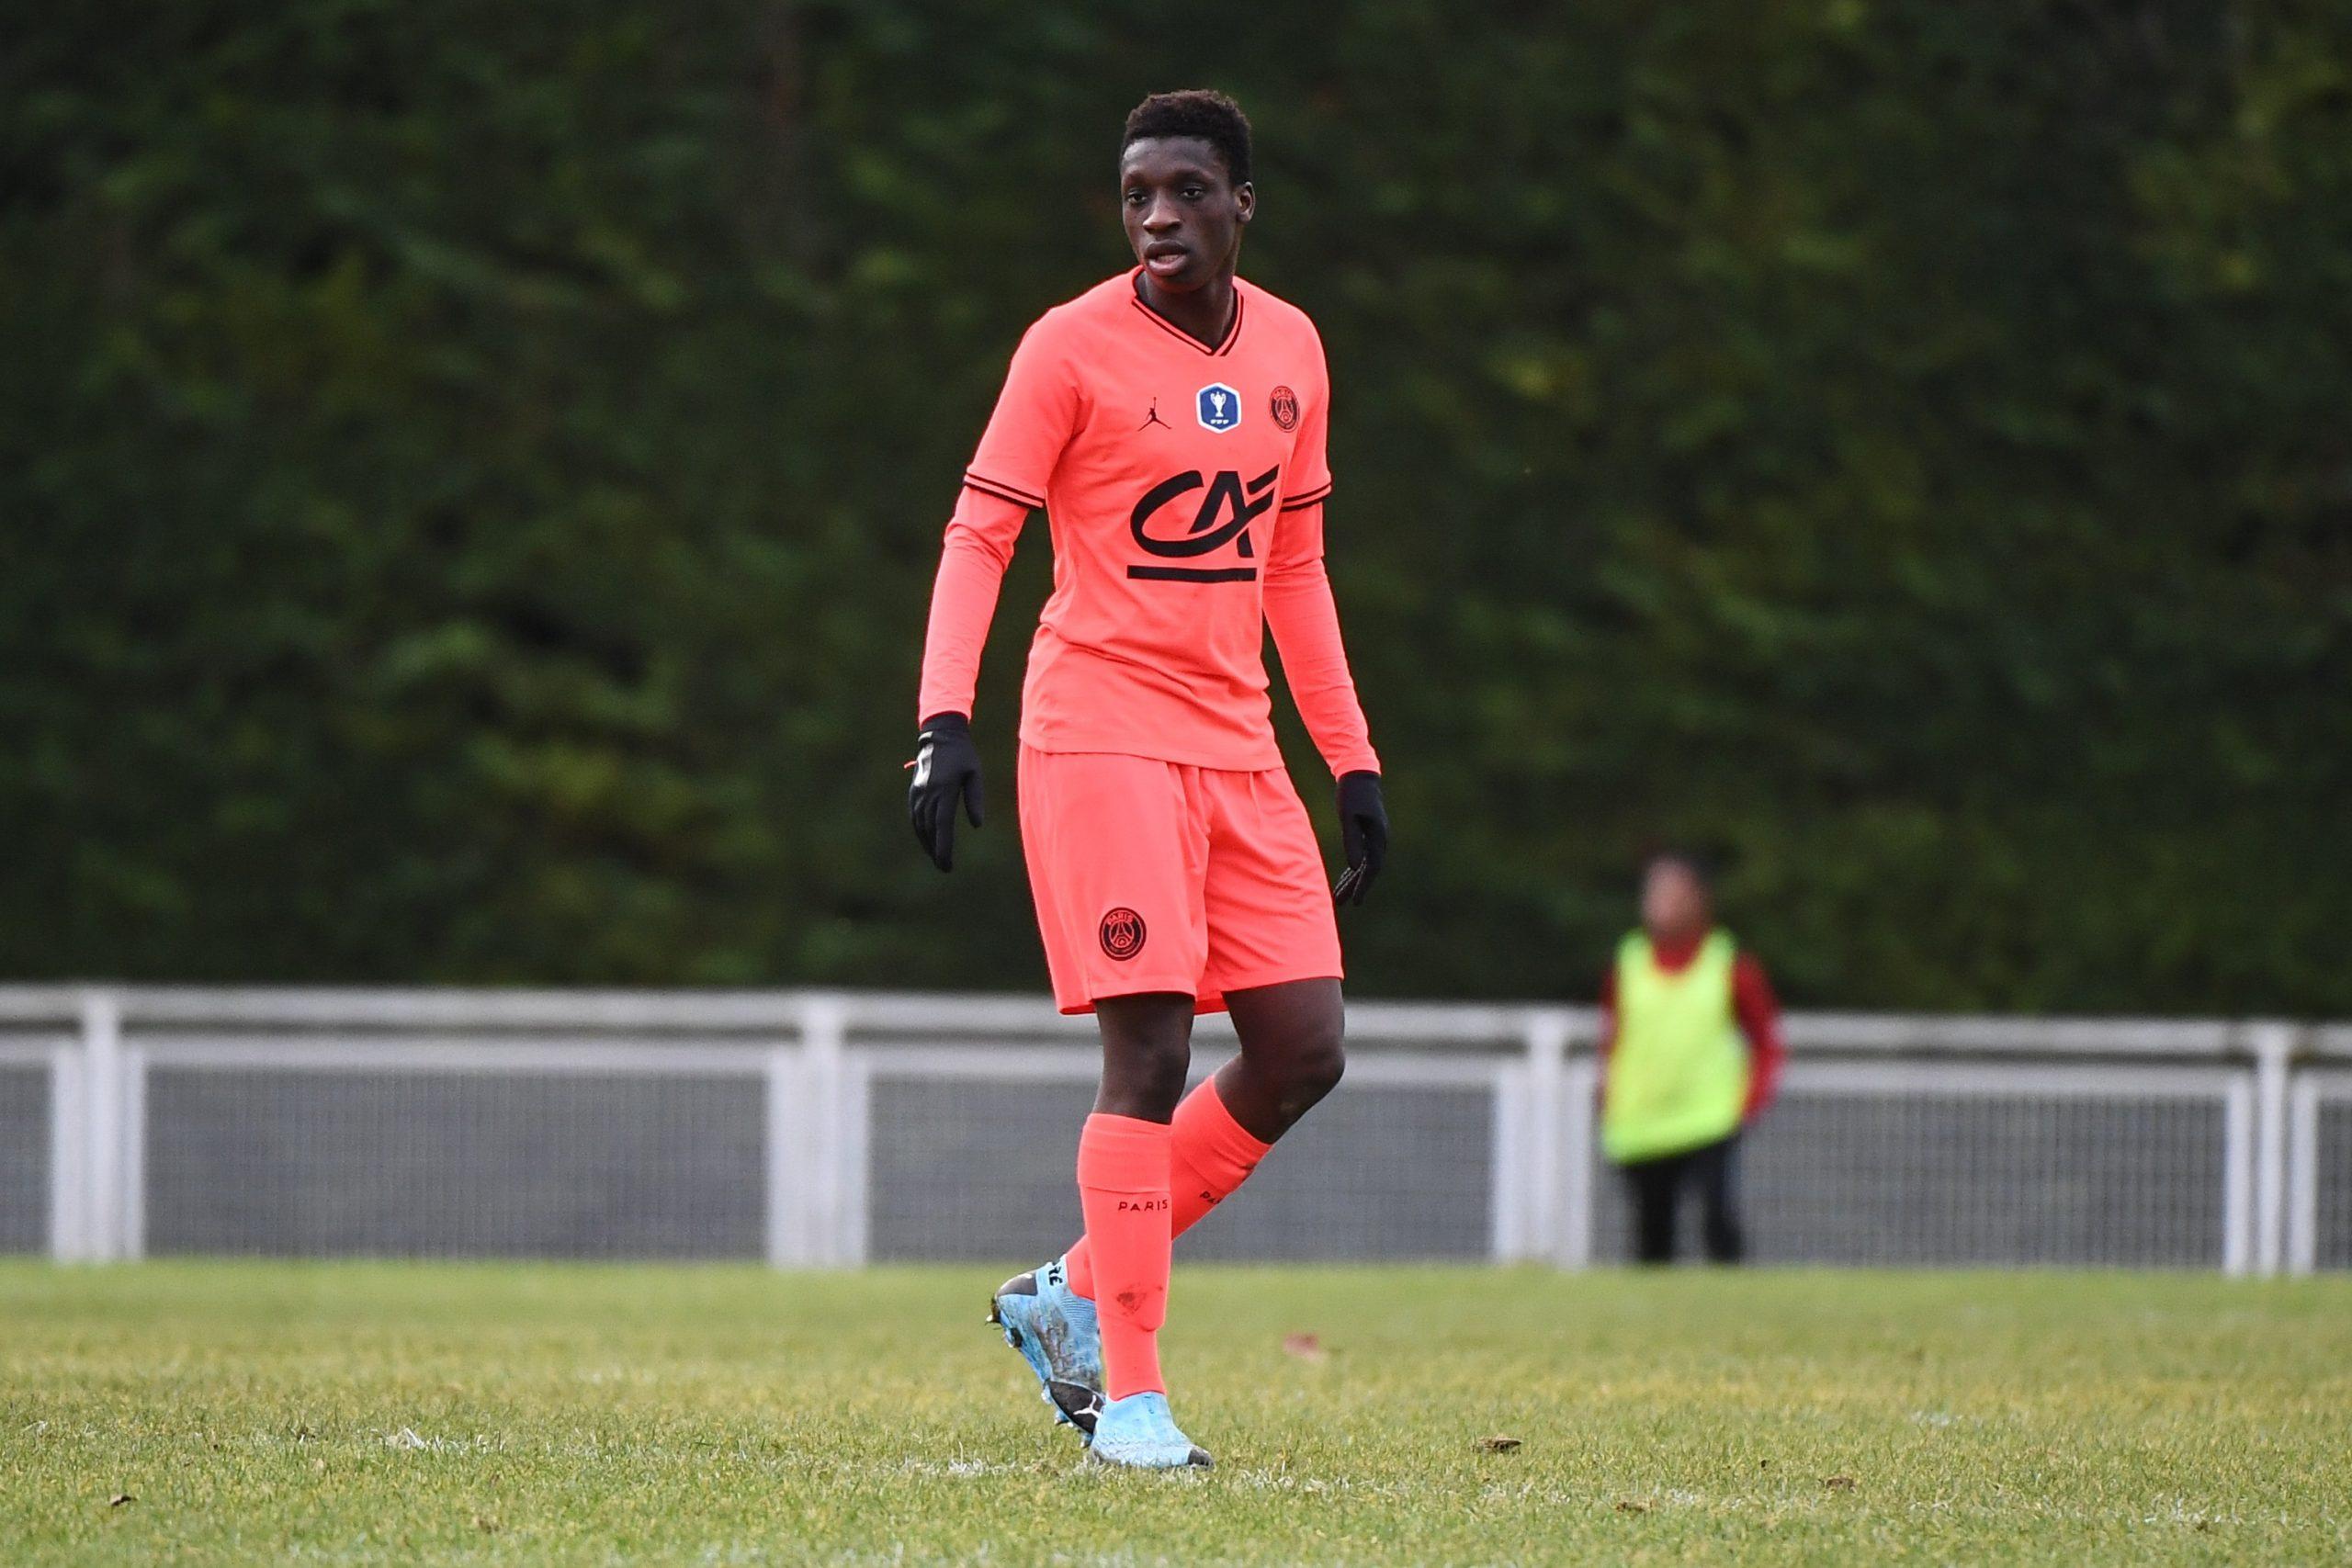 Abdoulaye Kamara, jeune Titi du PSG, signera professionnel prochainement selon RMC Sport